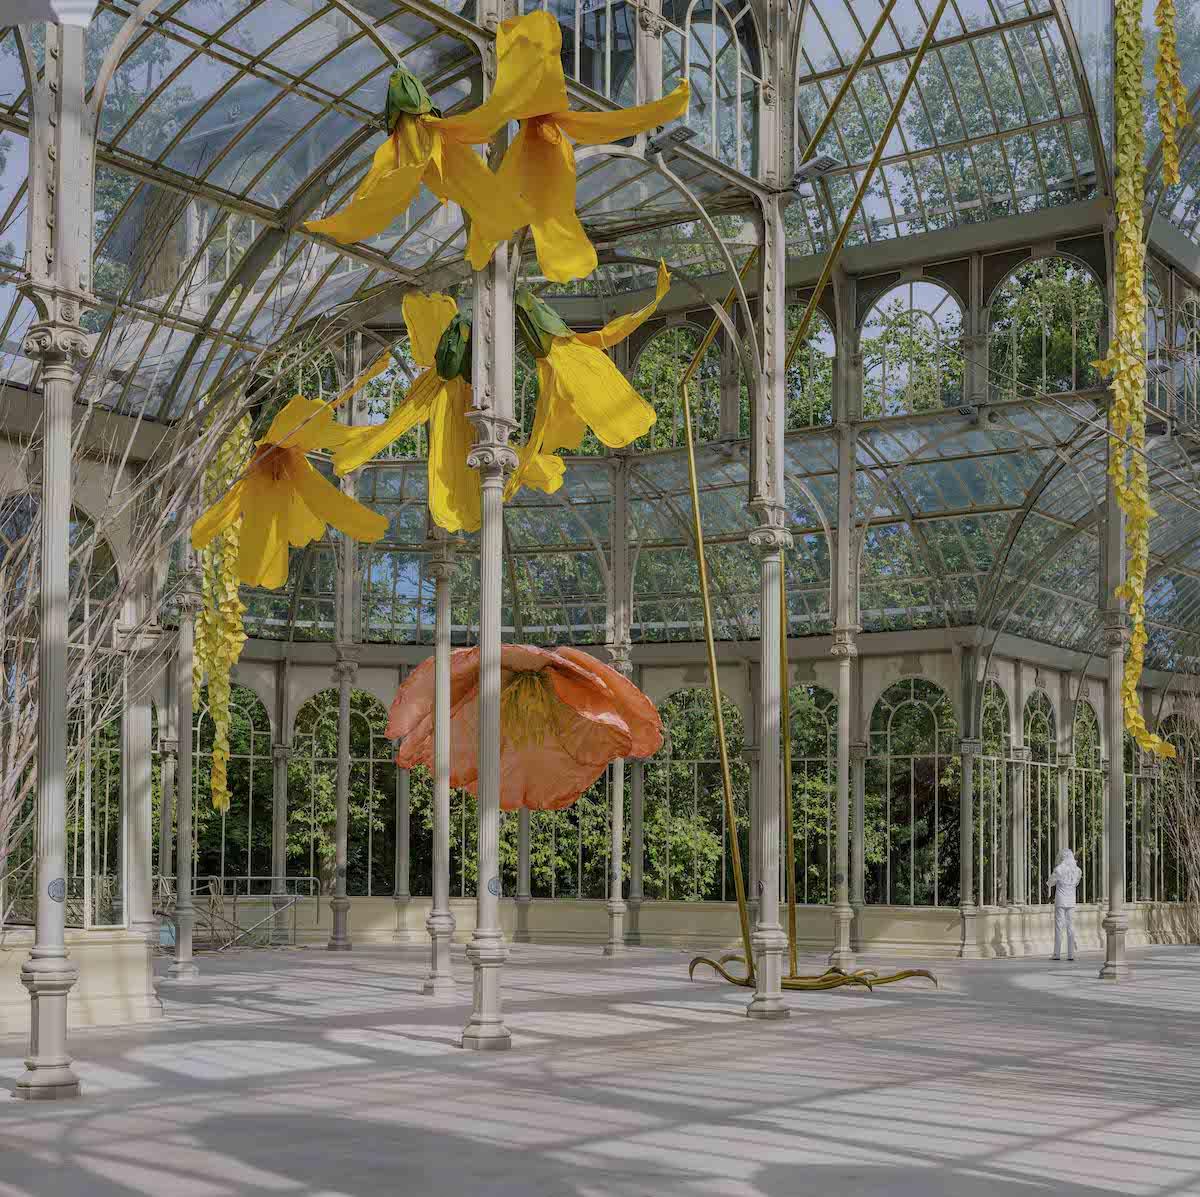 Incredible Giant Flowers Art Installation – Fubiz Media Design